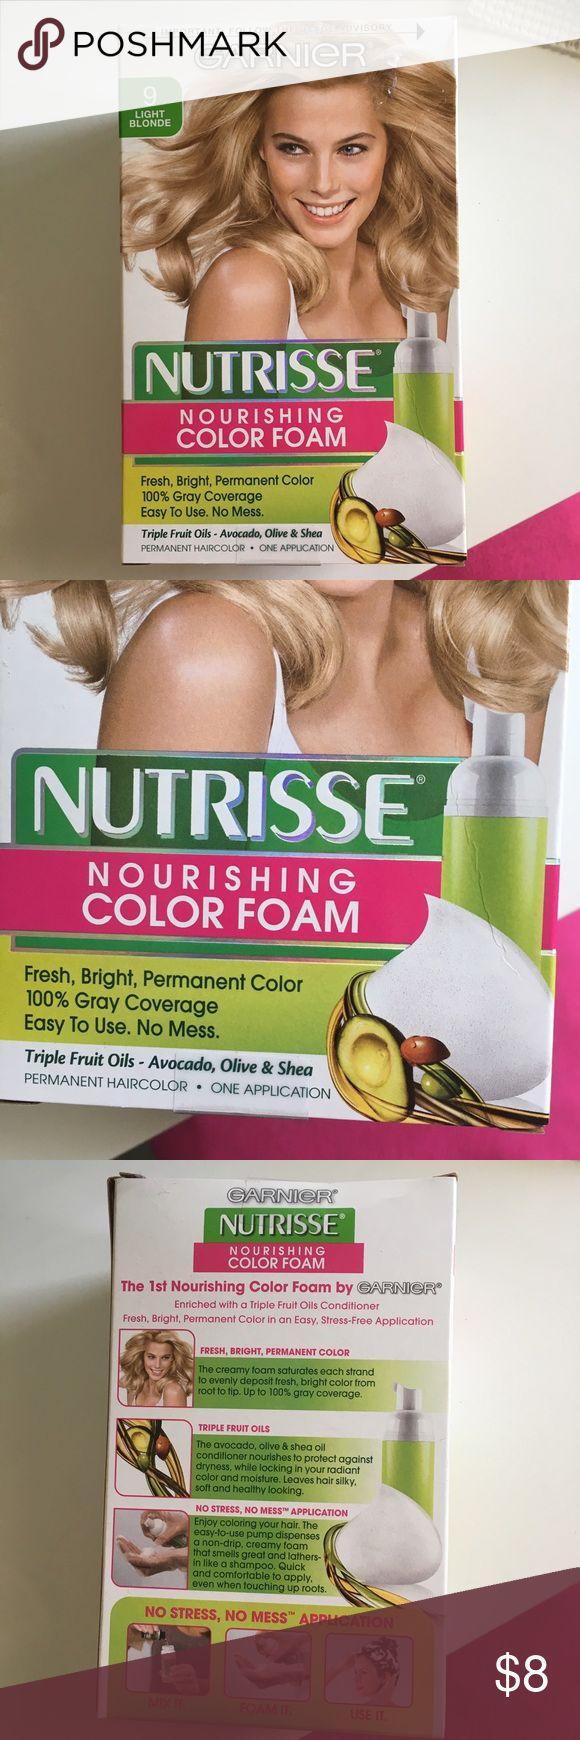 Garnier Blonde Color Foam Hair Dye Brand New. Unboxed. Color 9 Light Blonde Garnier Makeup